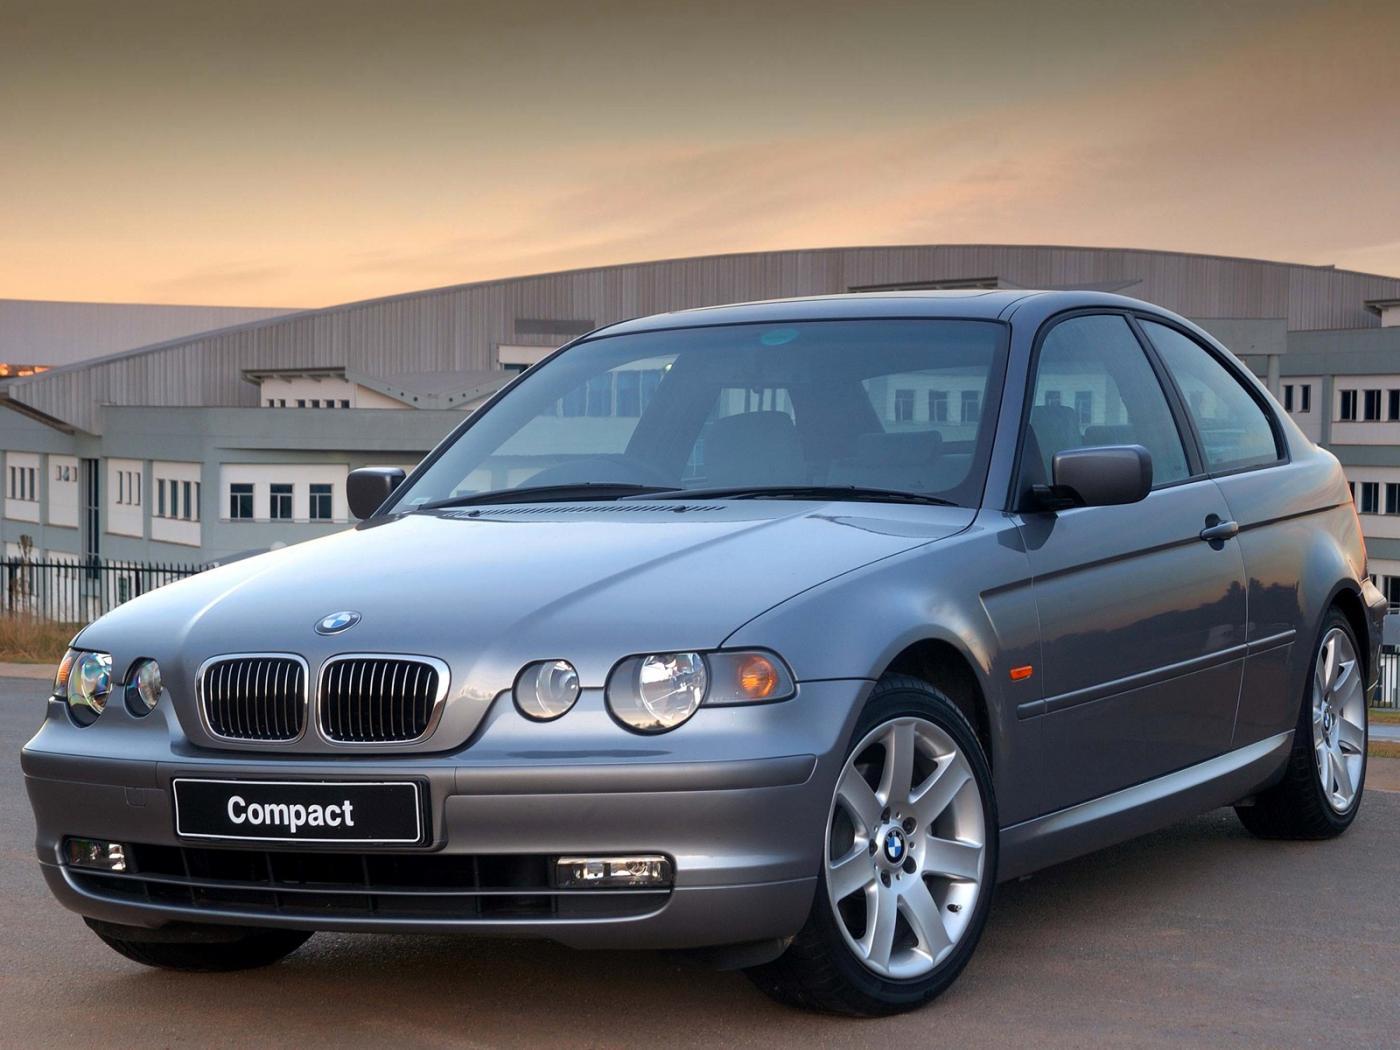 BMW-Serie-3-E46-Compact.jpeg